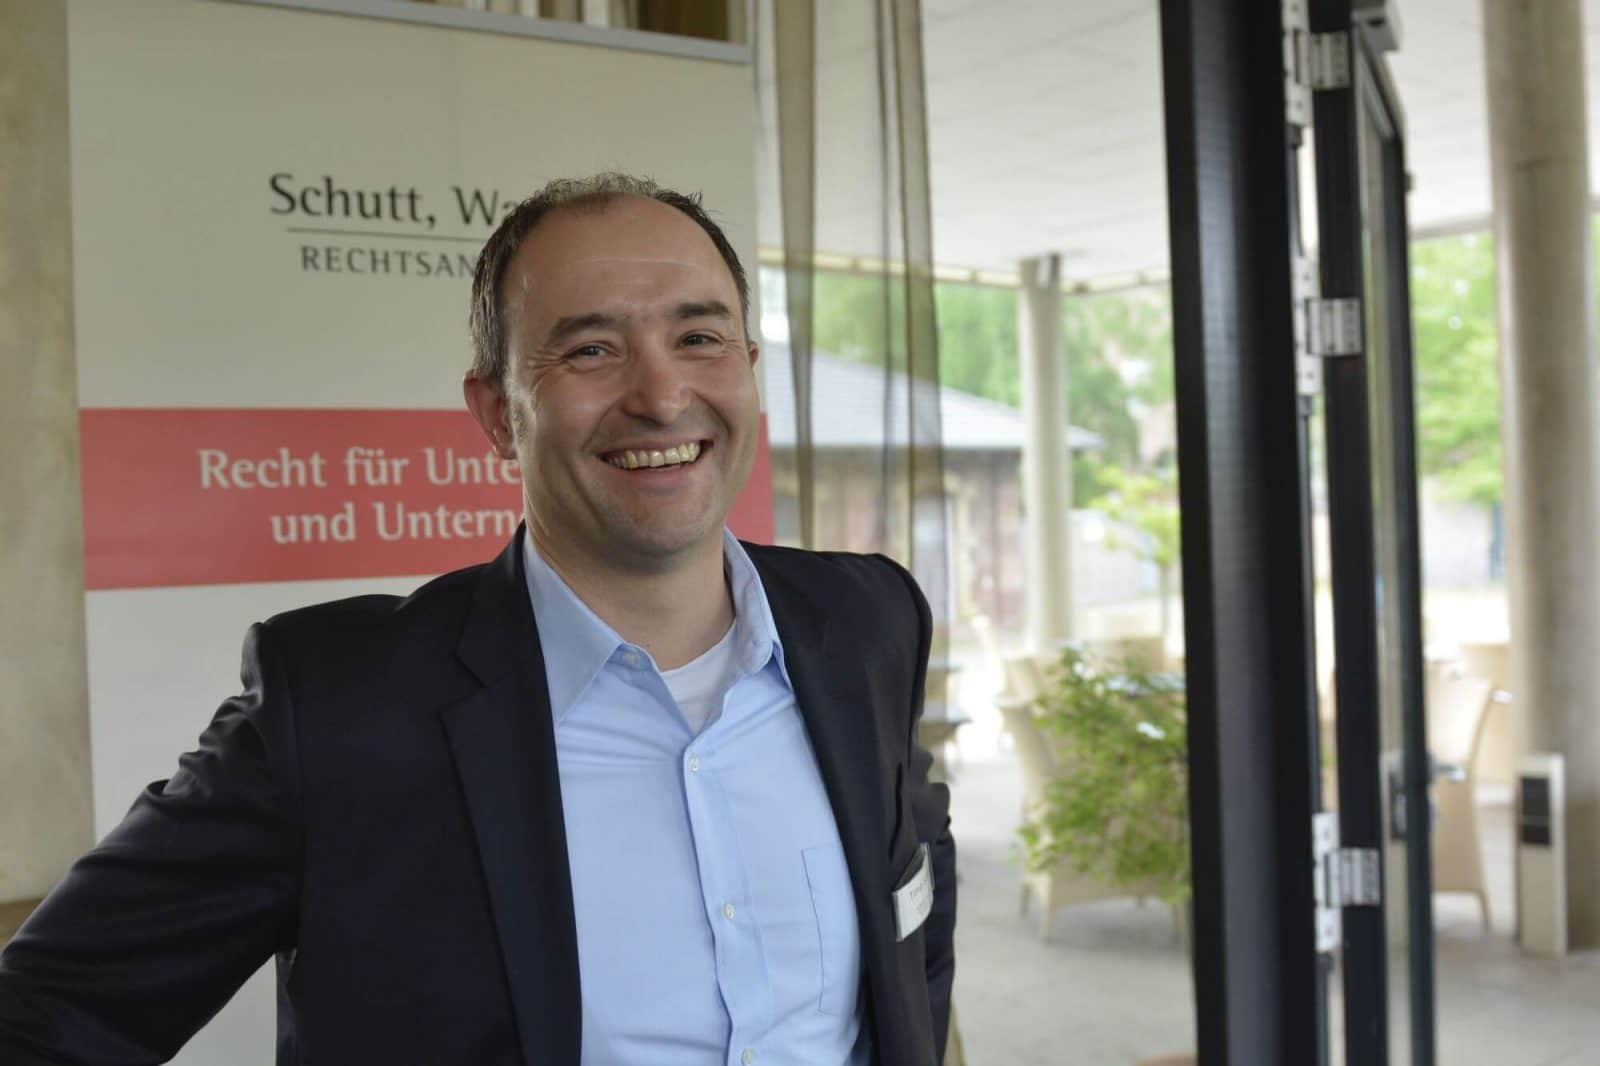 Schutt-Waetke